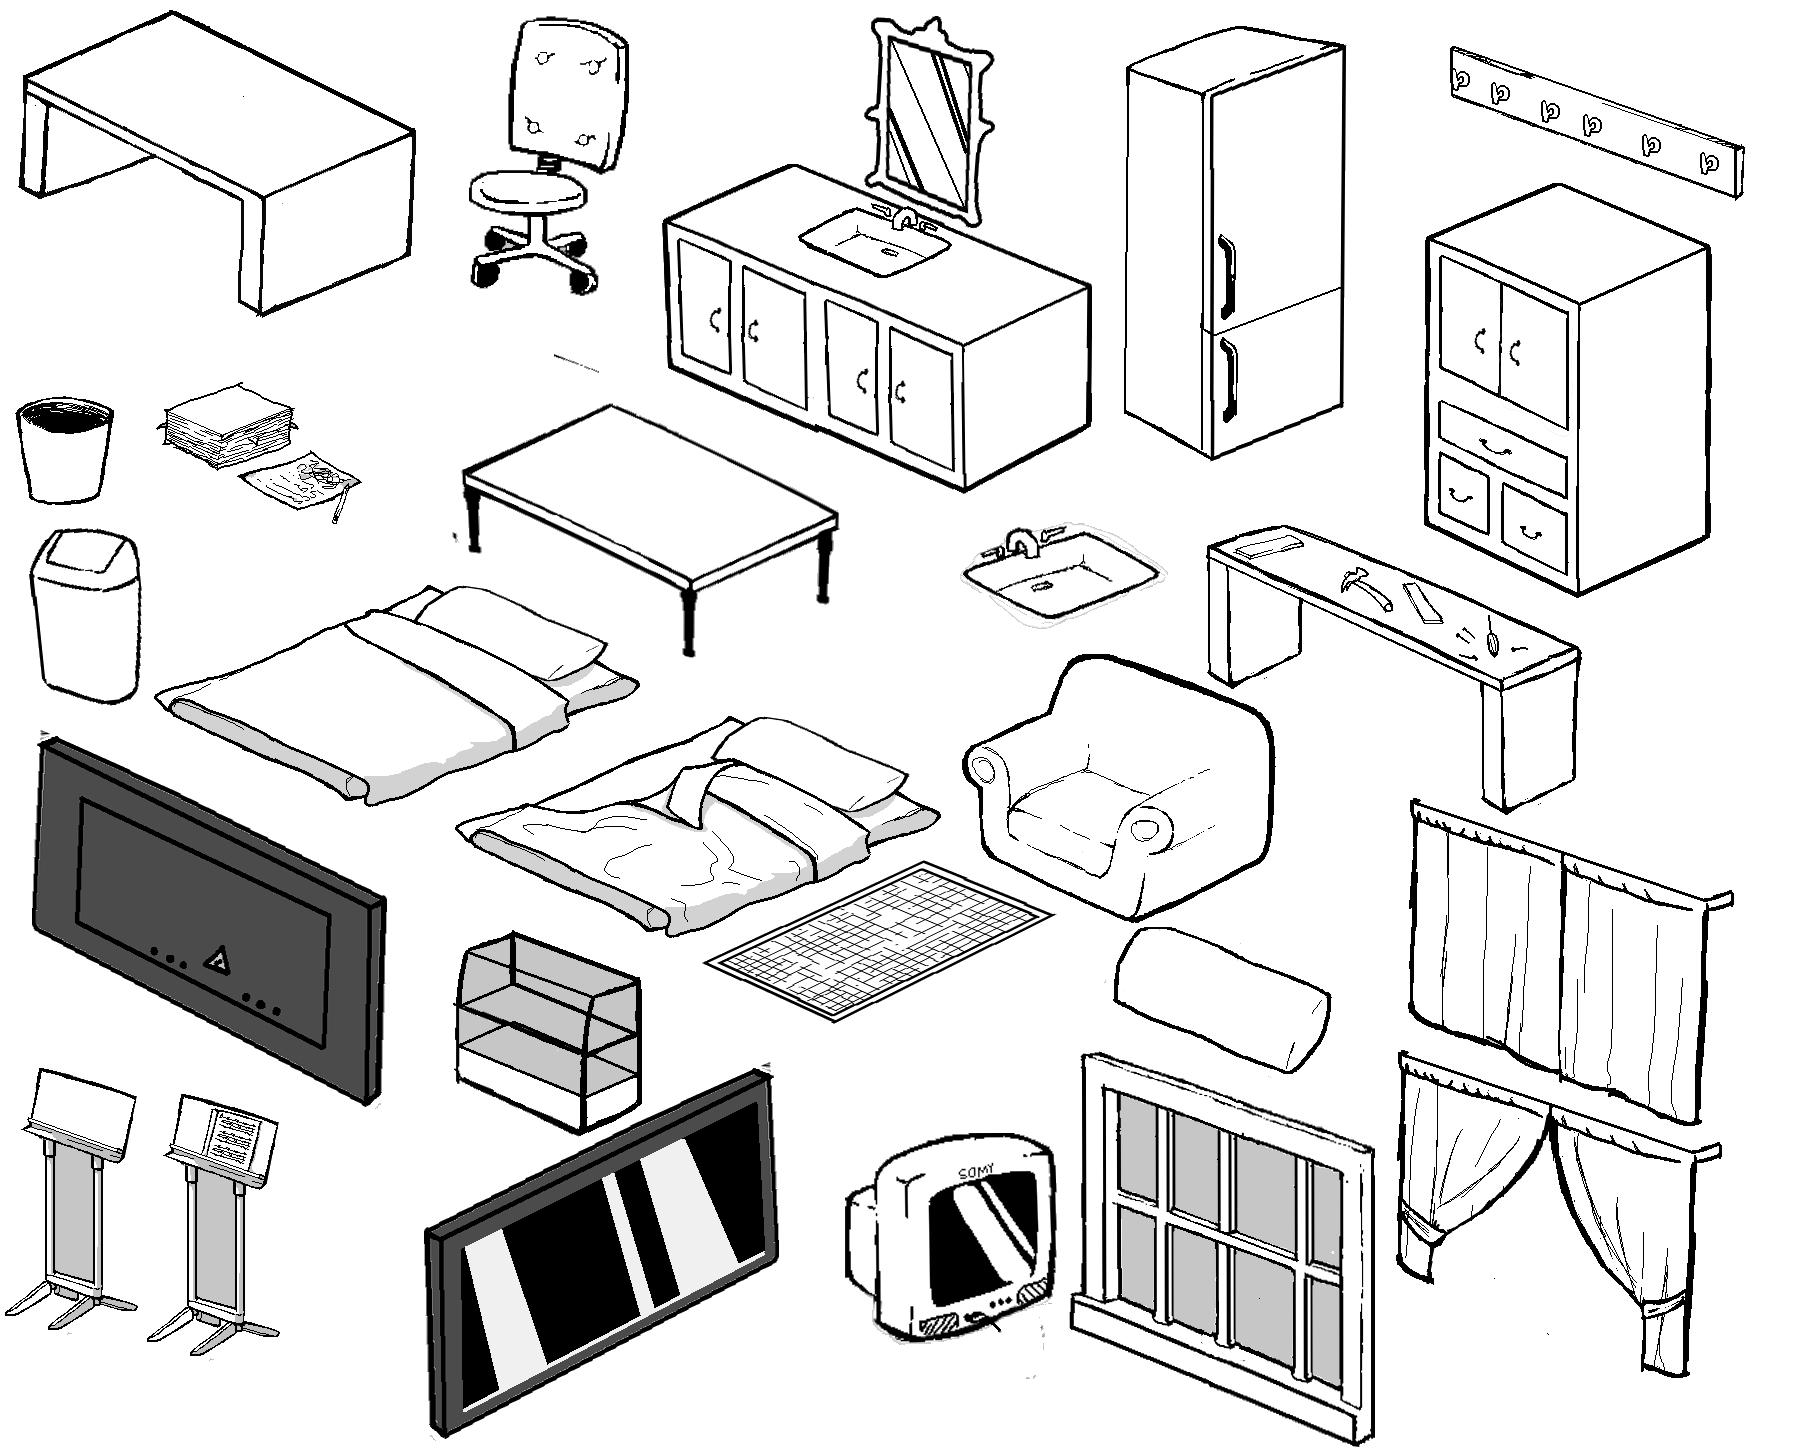 Drawn bedroom homestuck #10